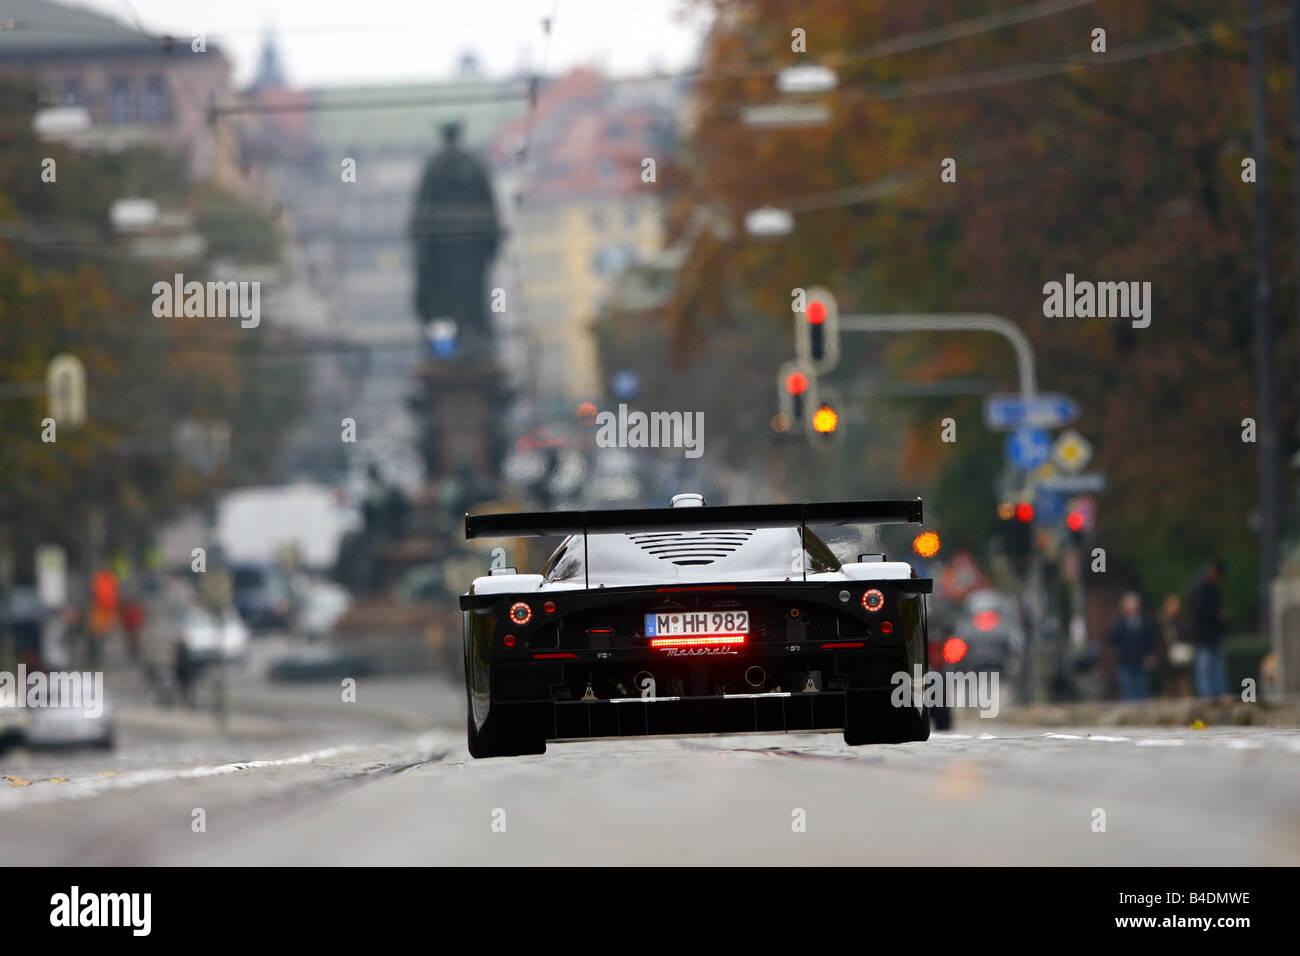 Maserati MC 12 Corsa, model year 2007-, black, driving, diagonal from the back, rear view, City - Stock Image